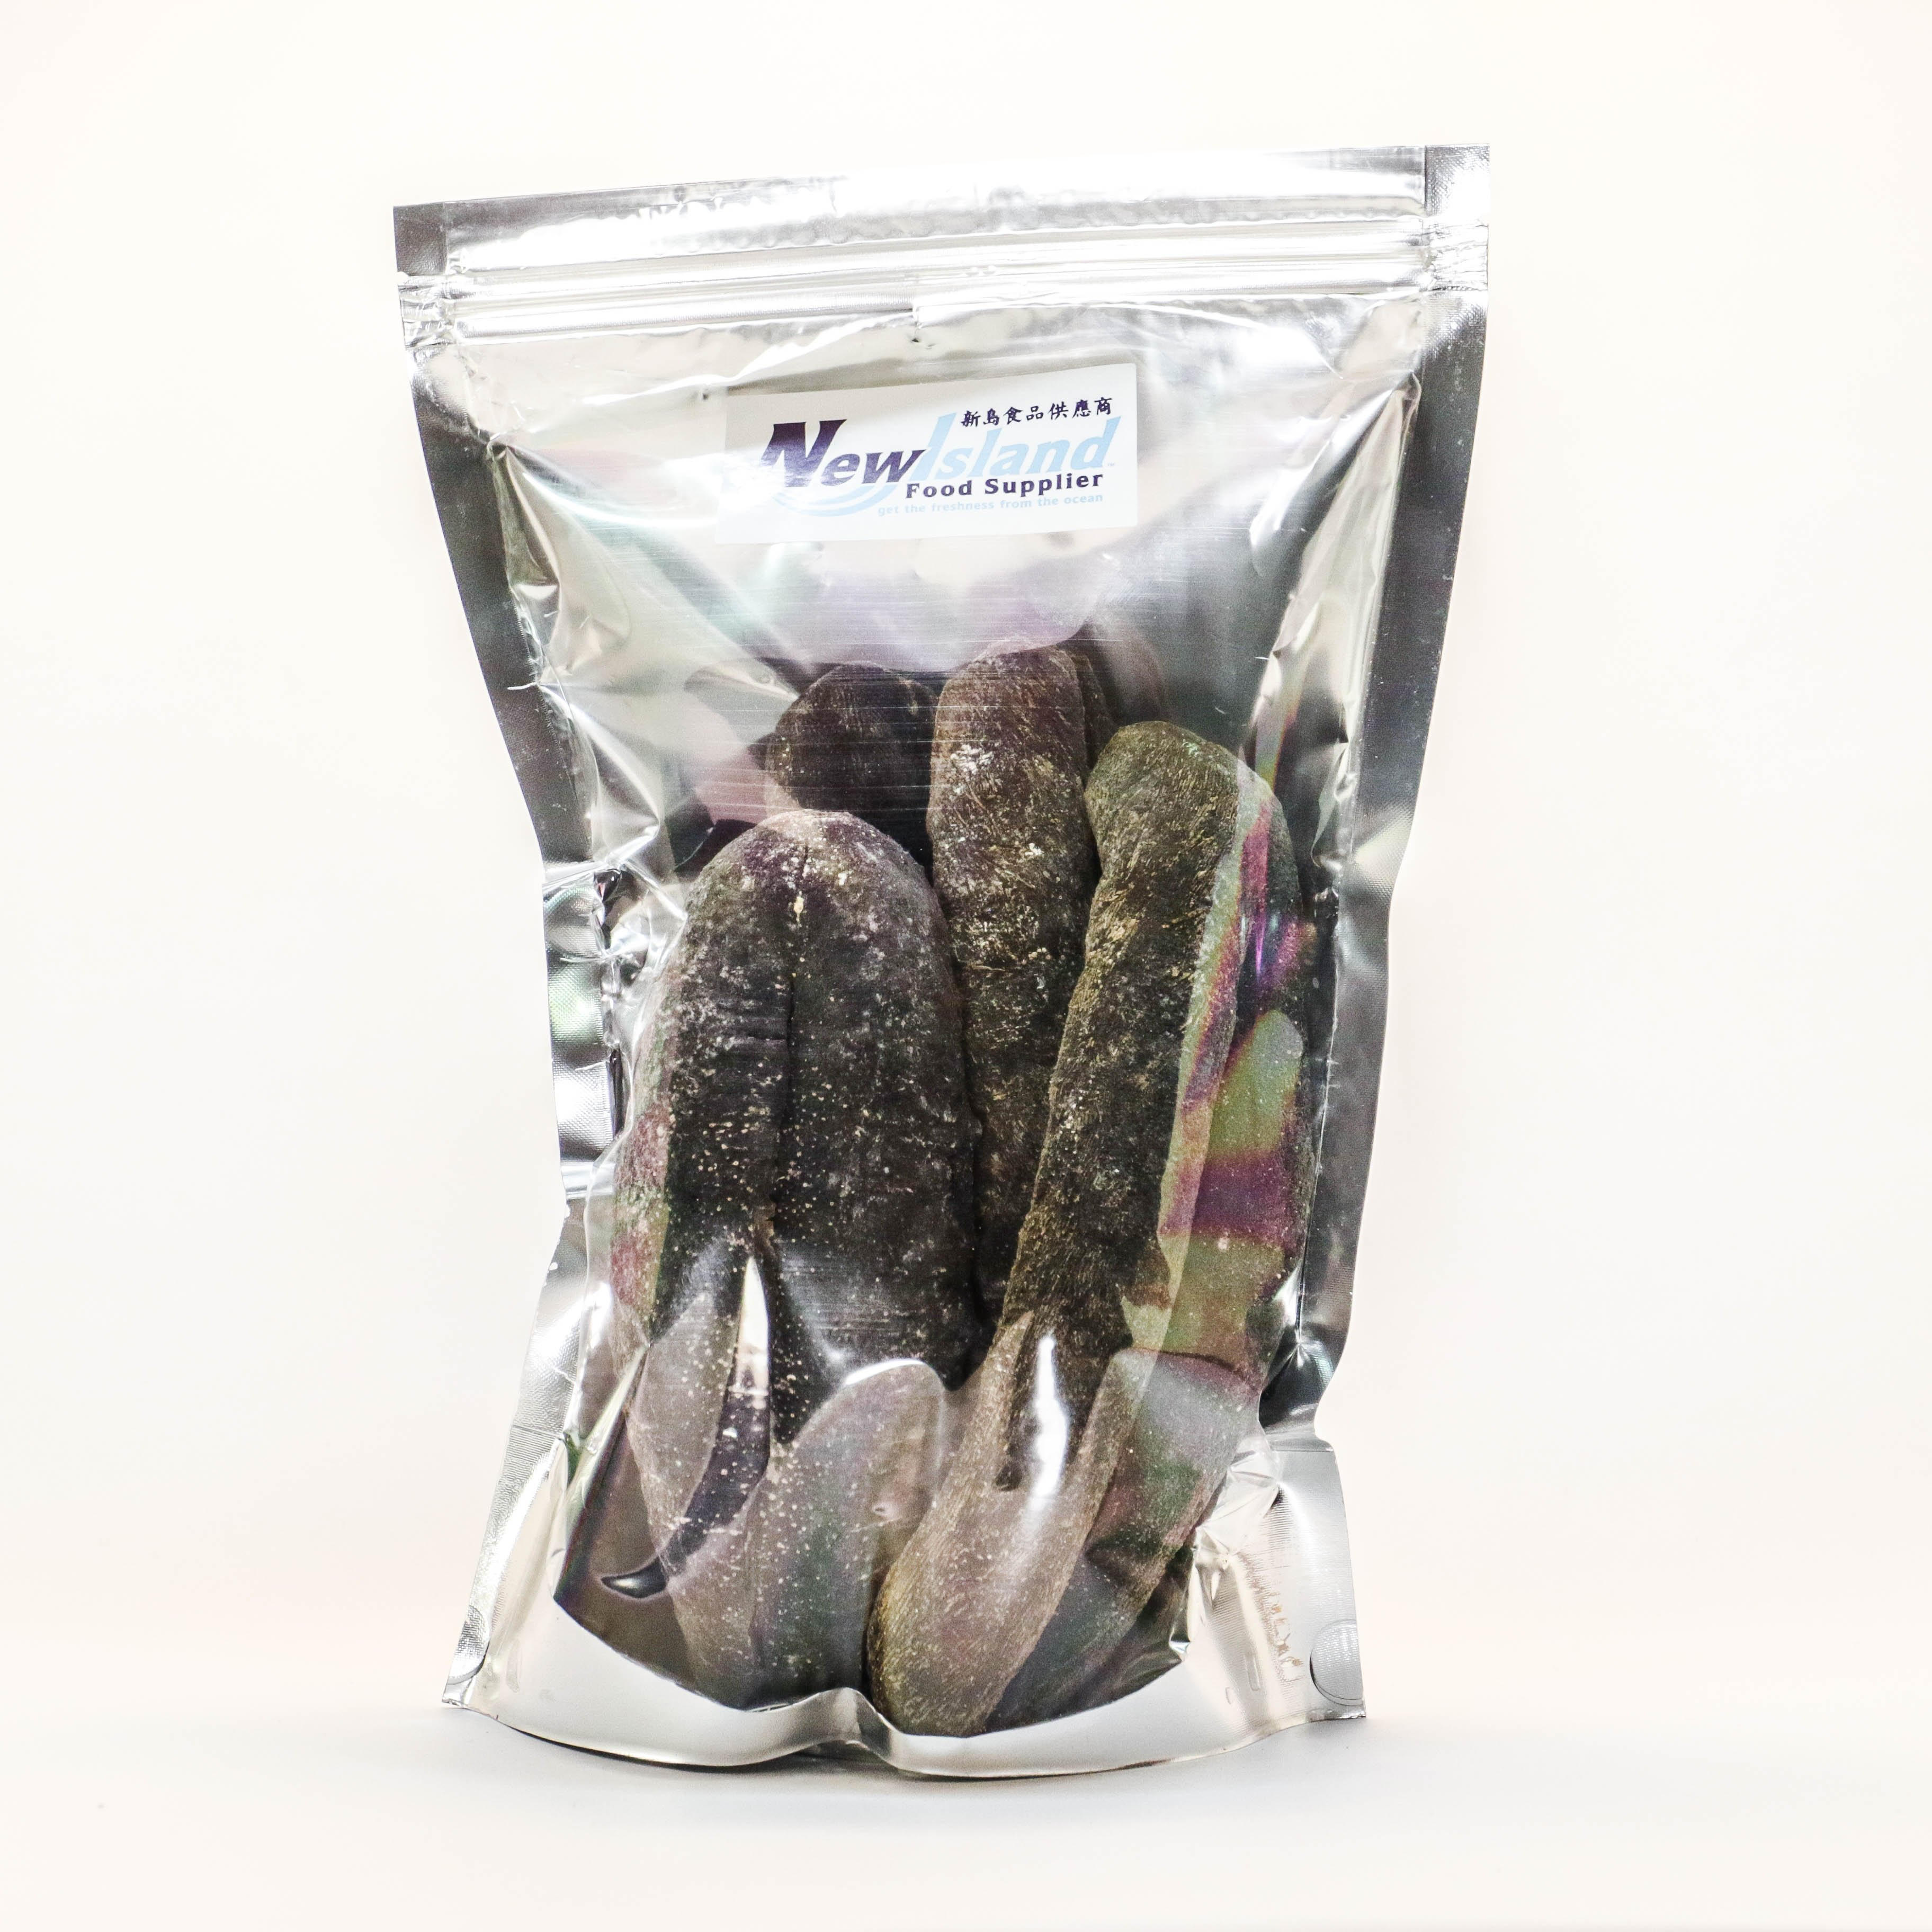 Sea Cucumber 海参 - White Teat Sea Cucumber 猪母参 (500g/Pkt)